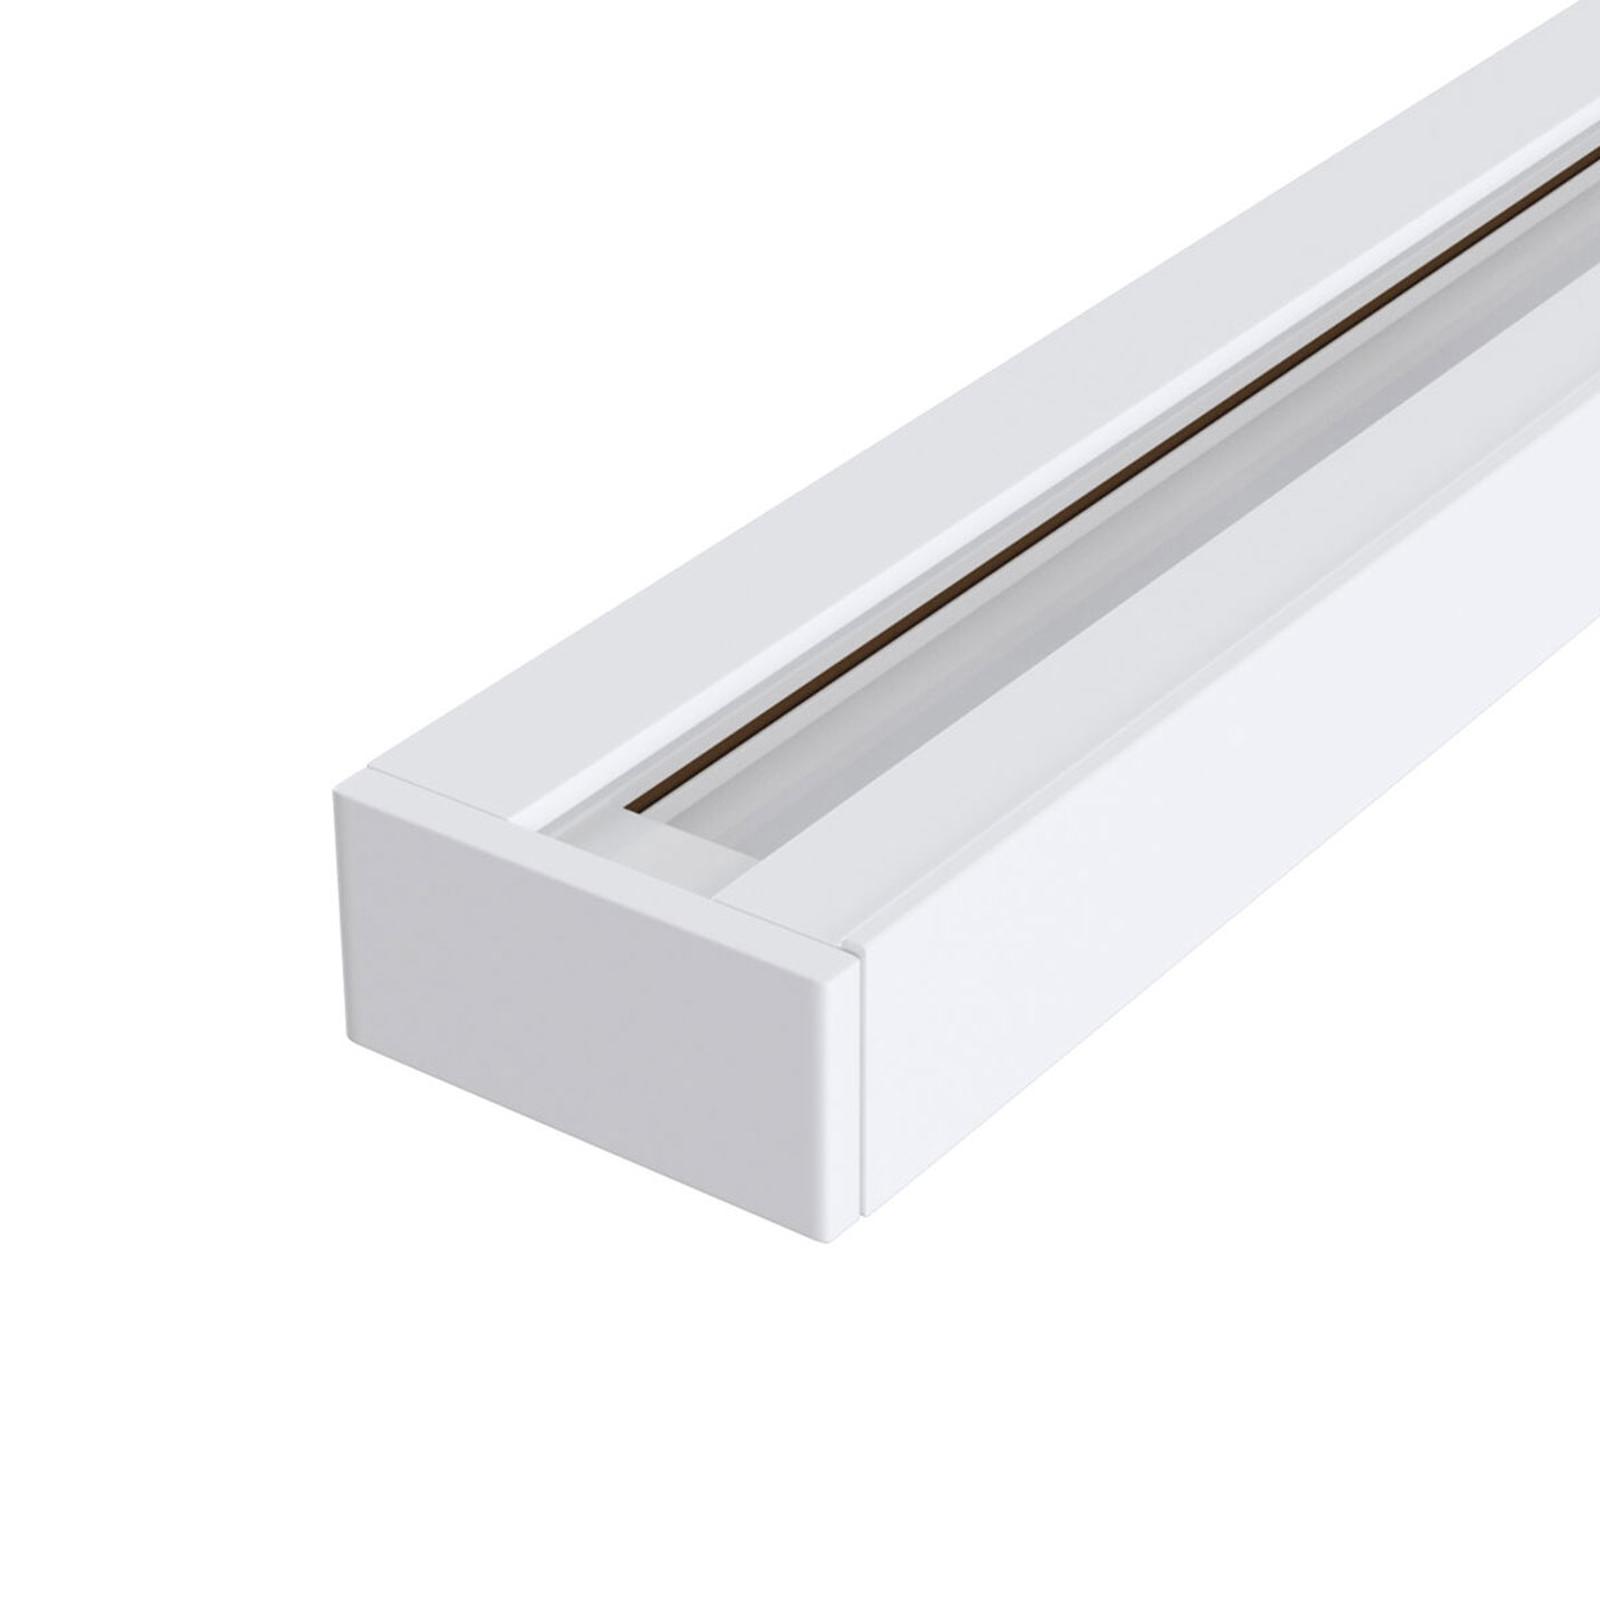 Track 1-fase skinne hvit, 200 cm